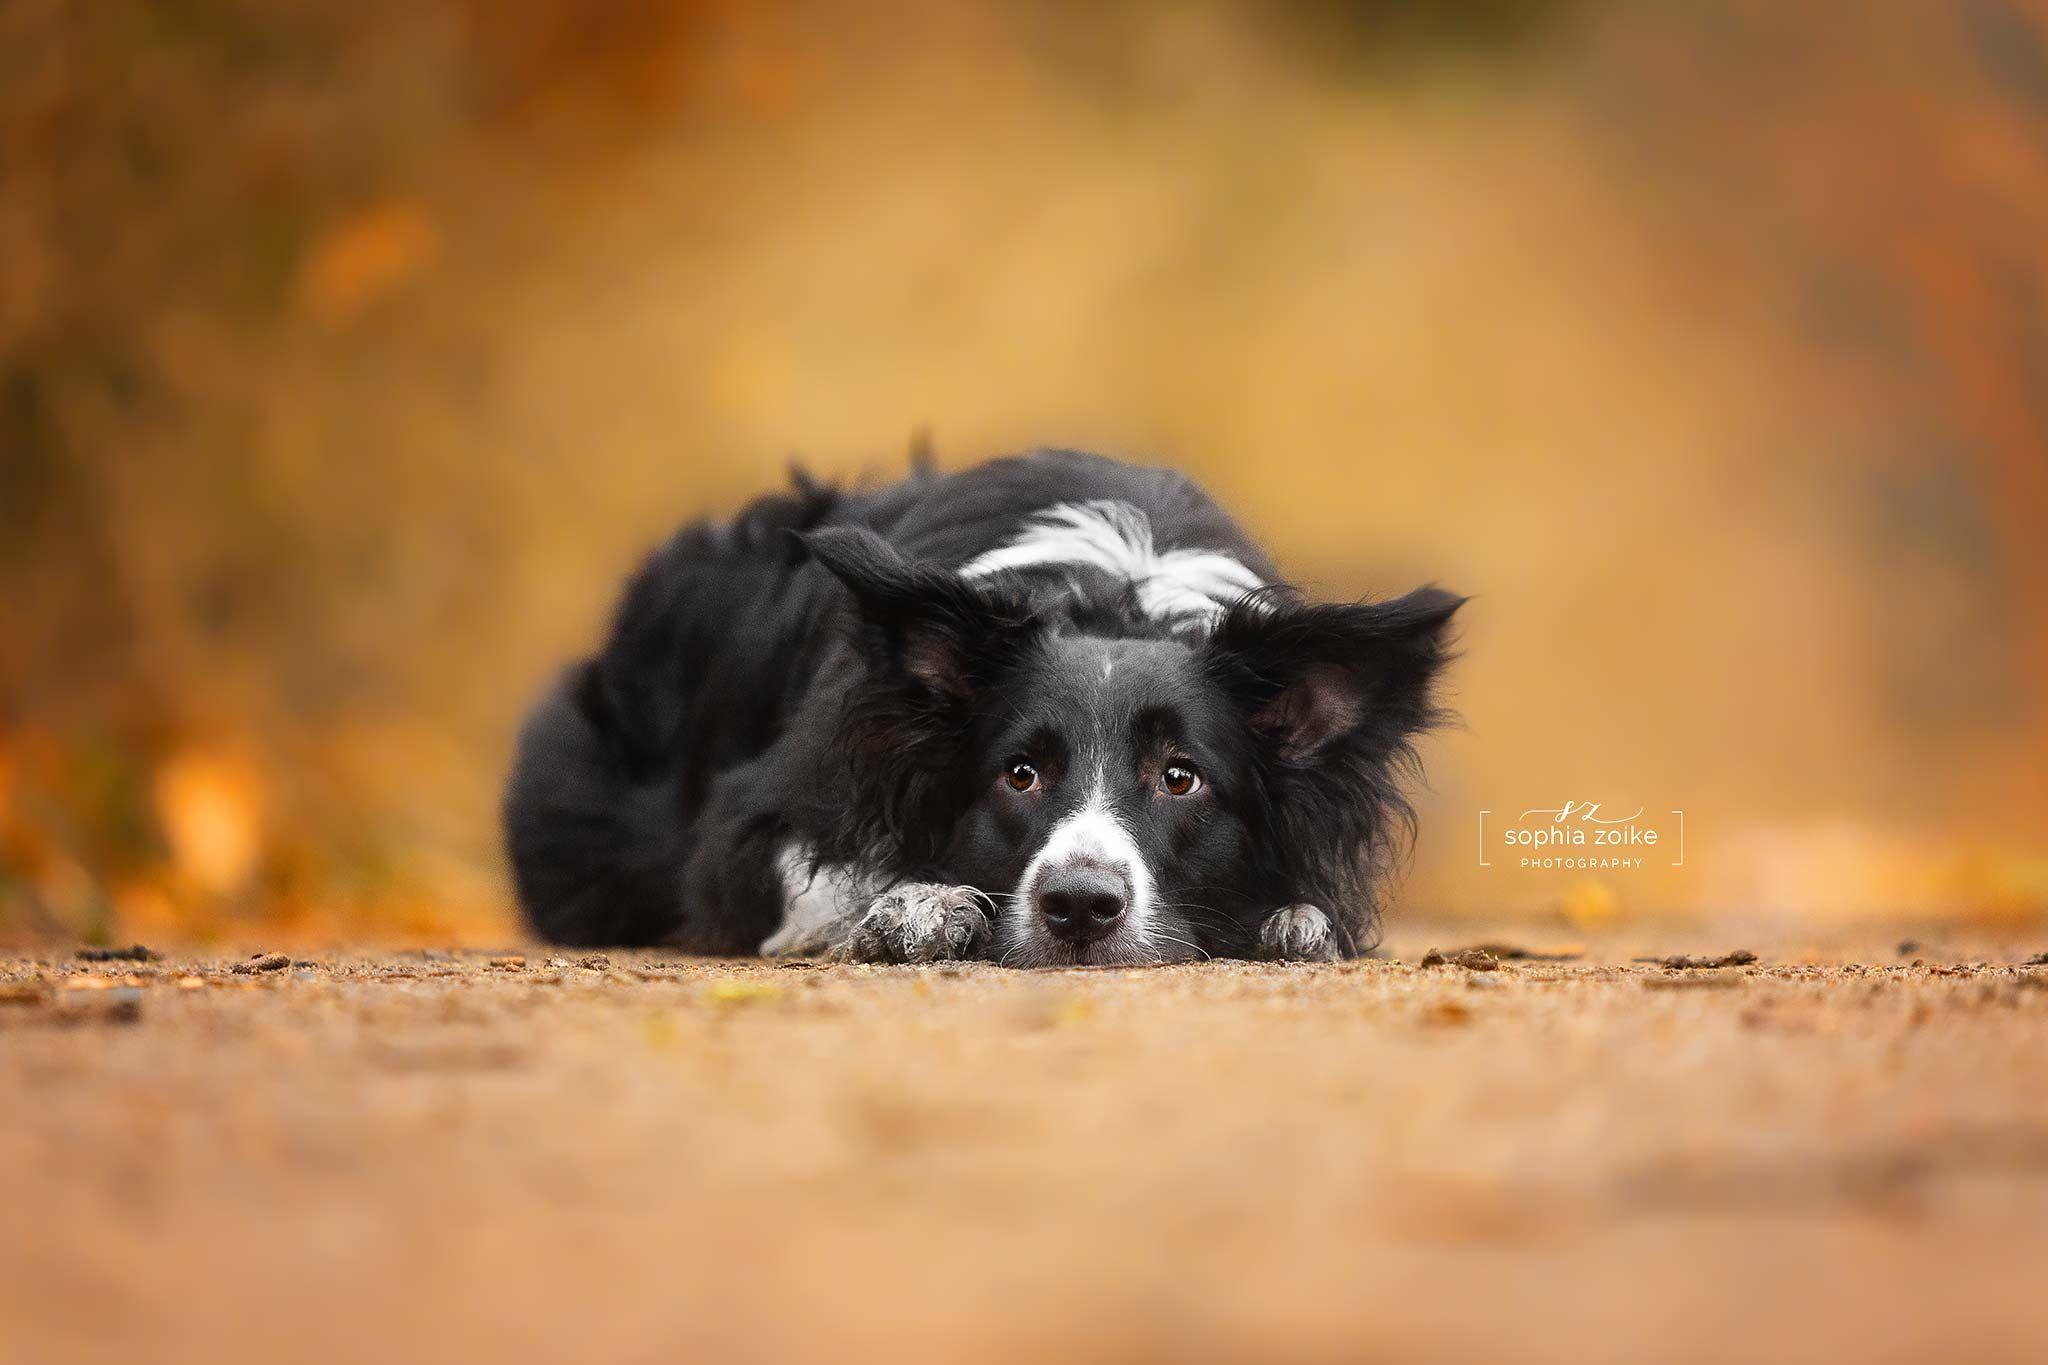 Australian Shepherd Saphira Hundefotografie Hundeshooting Potsdam Berlin Und Brandenburg Australian Shepherds Australian Shepherd Hund Hundefotografie